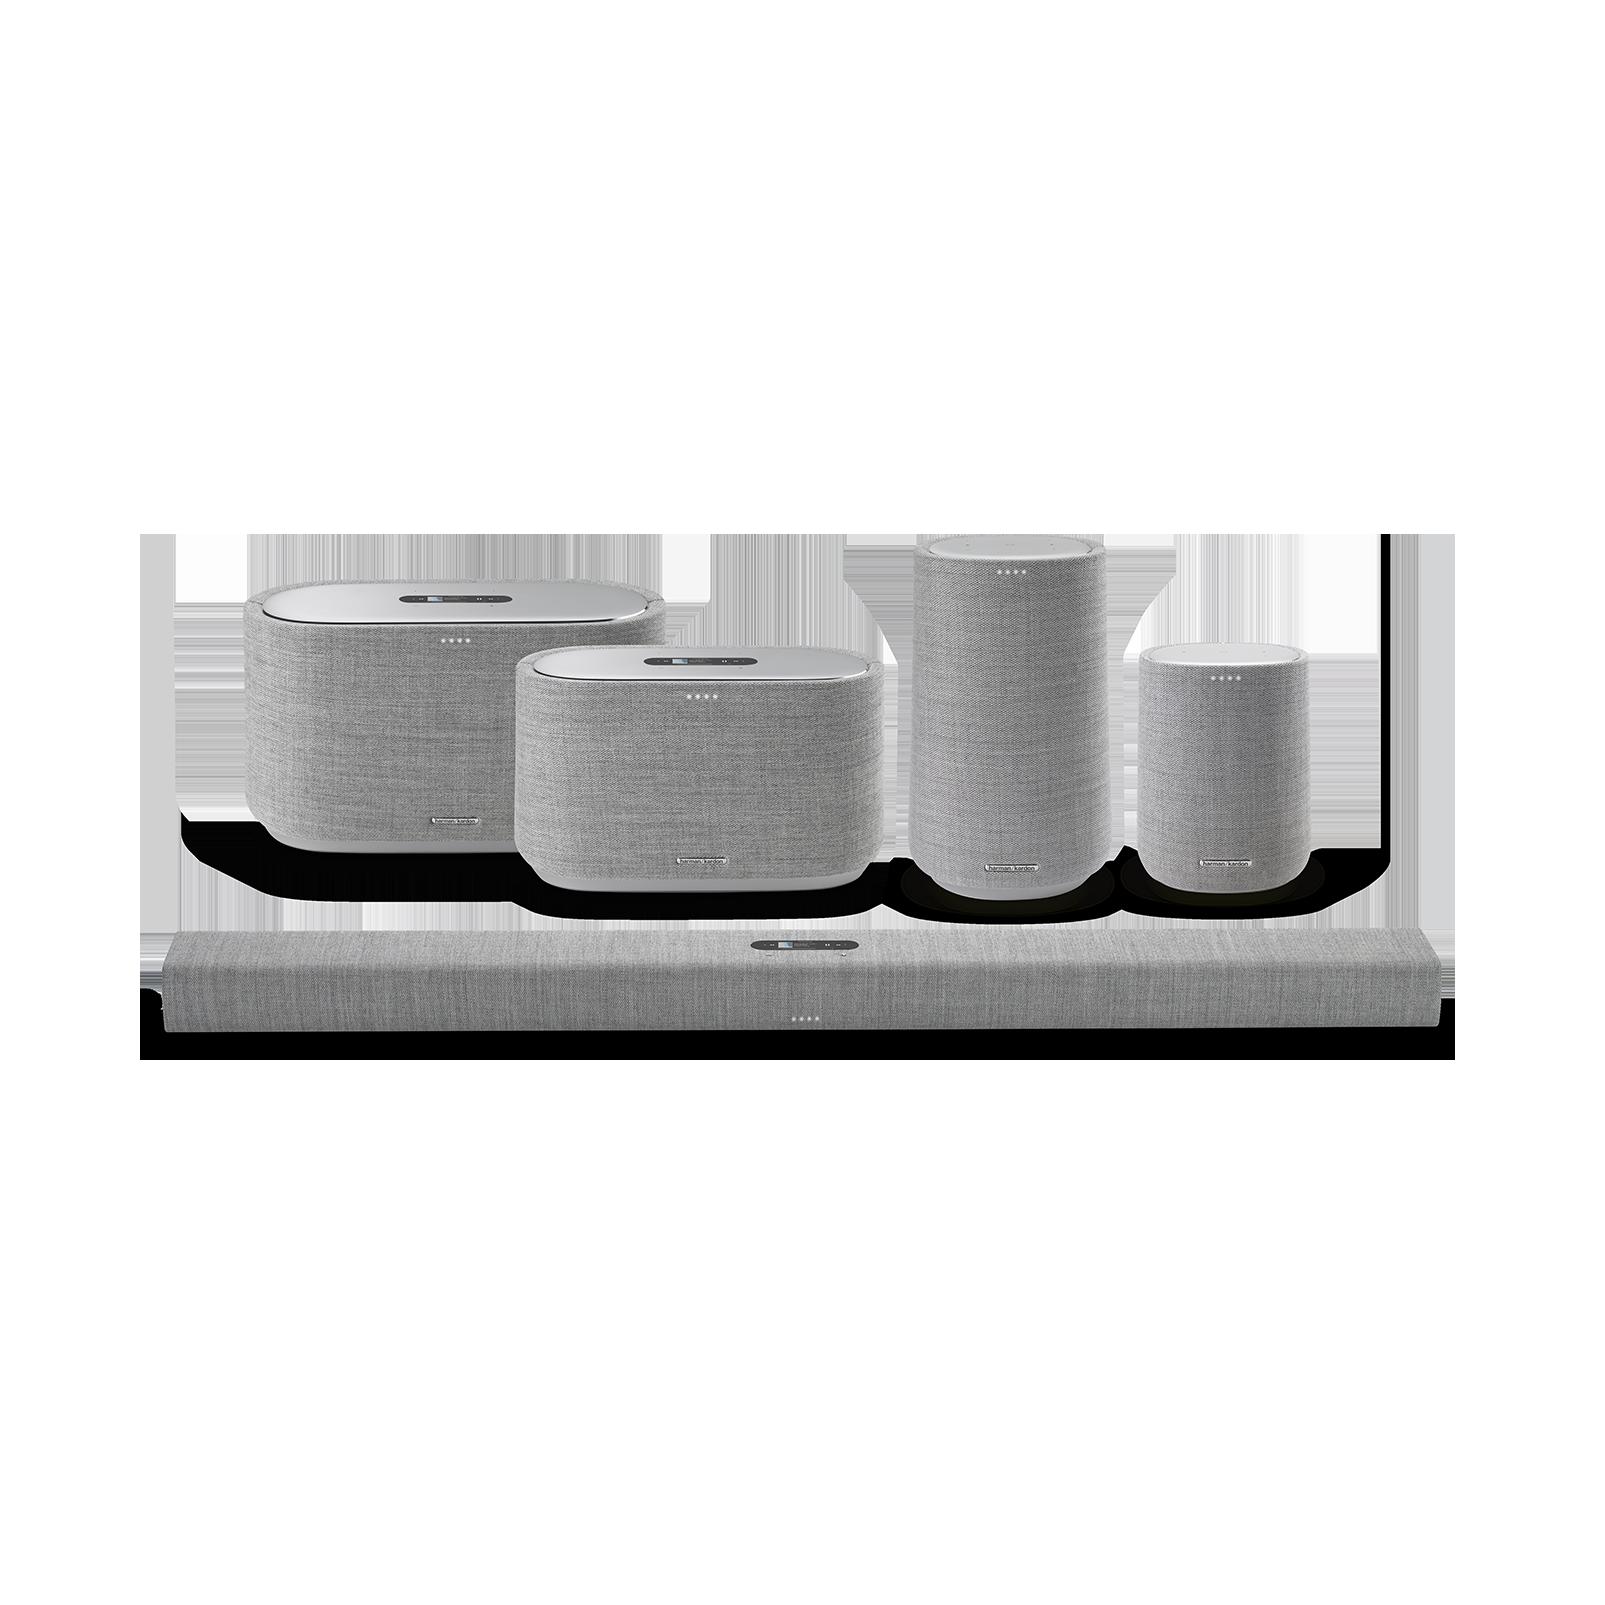 Harman Kardon Citation Bar - Grey - The smartest soundbar for movies and music - Detailshot 5